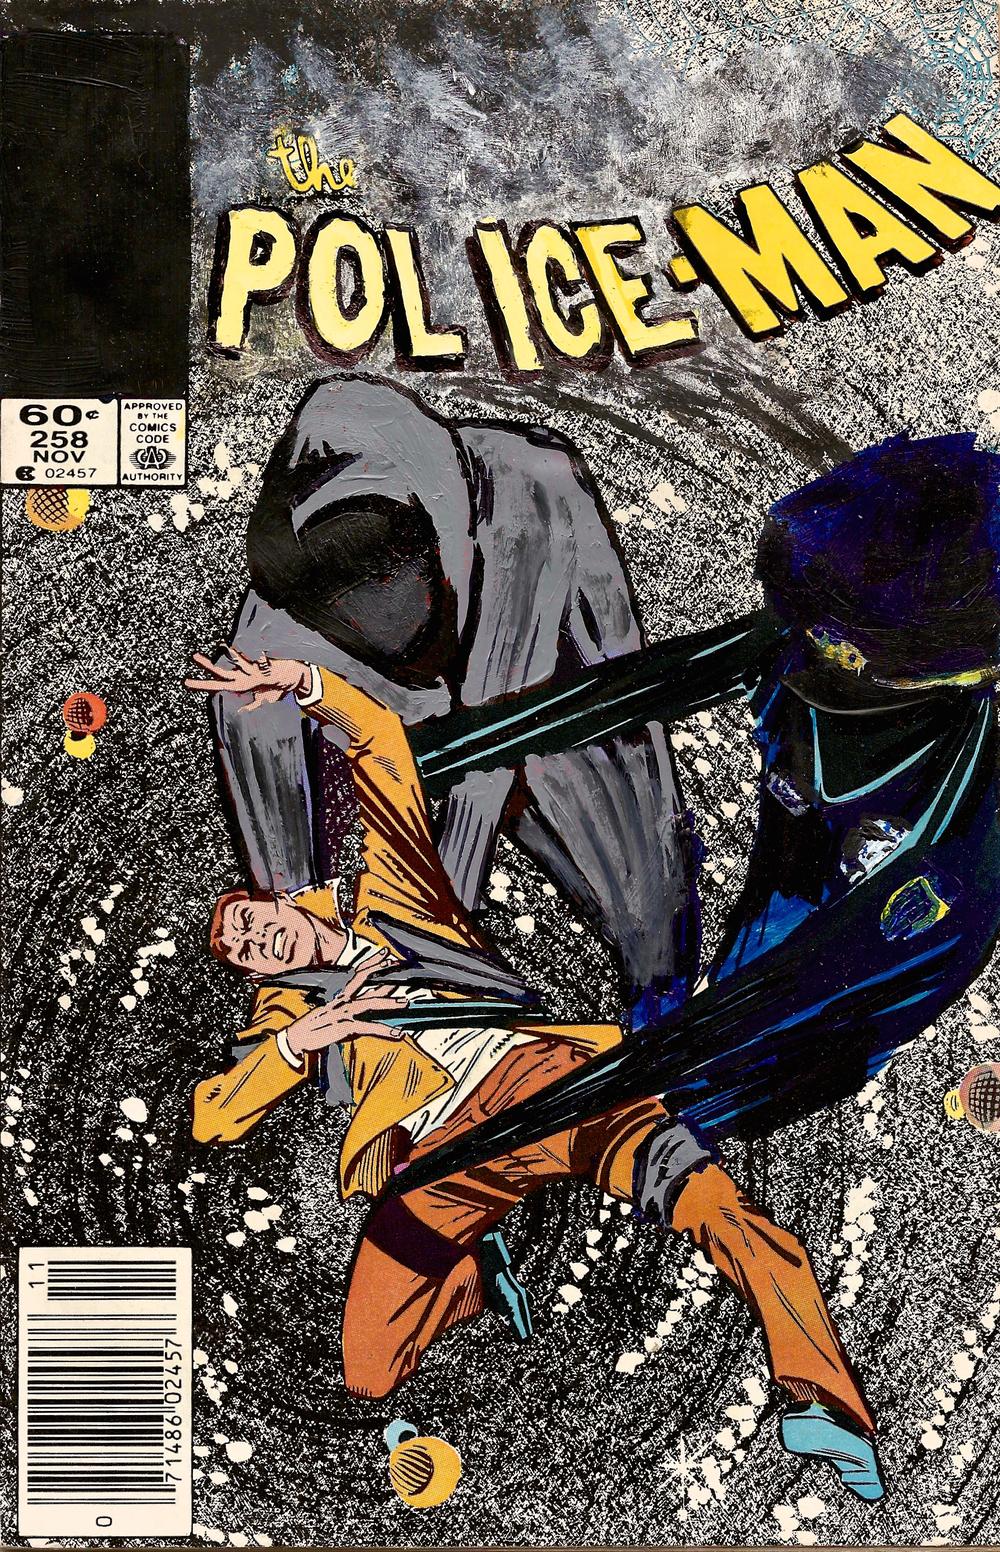 Police-Man #258